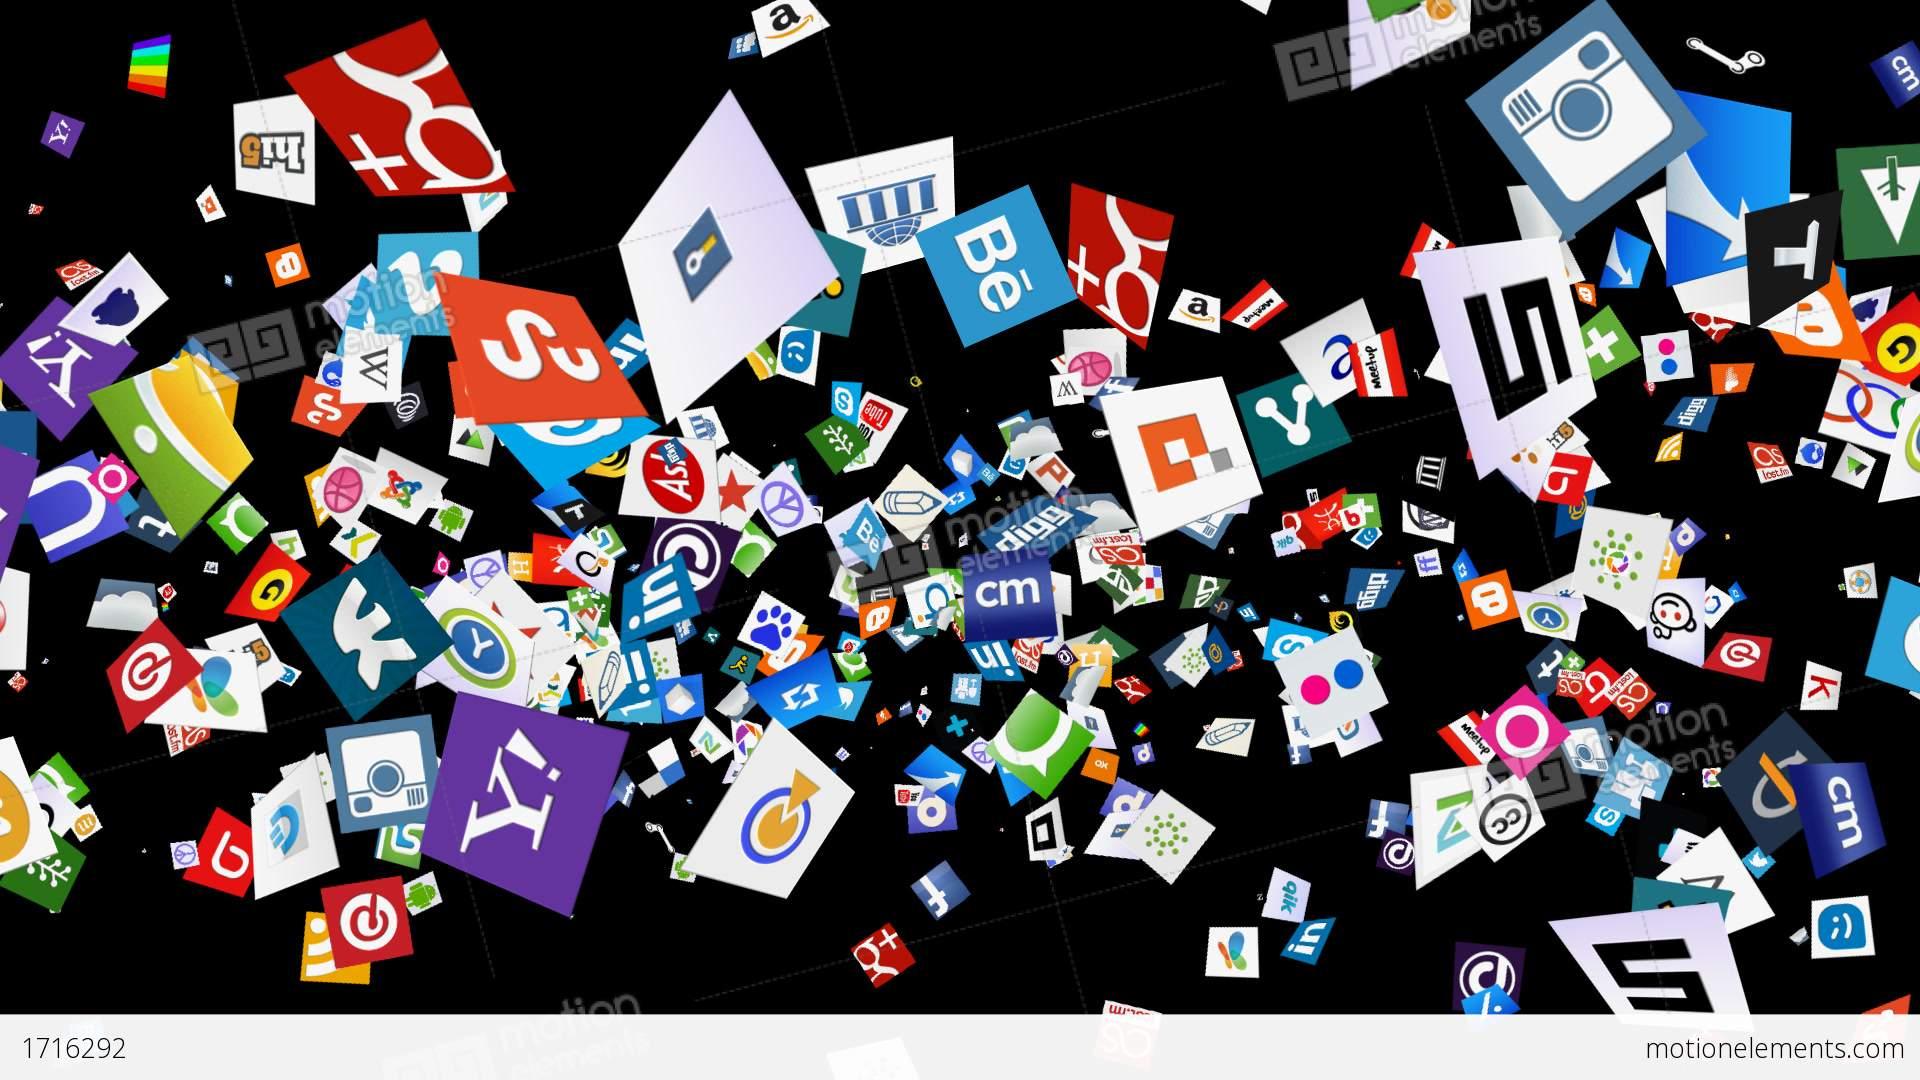 me1716292-social-media-confetti-explosion-hd-a0030.jpg